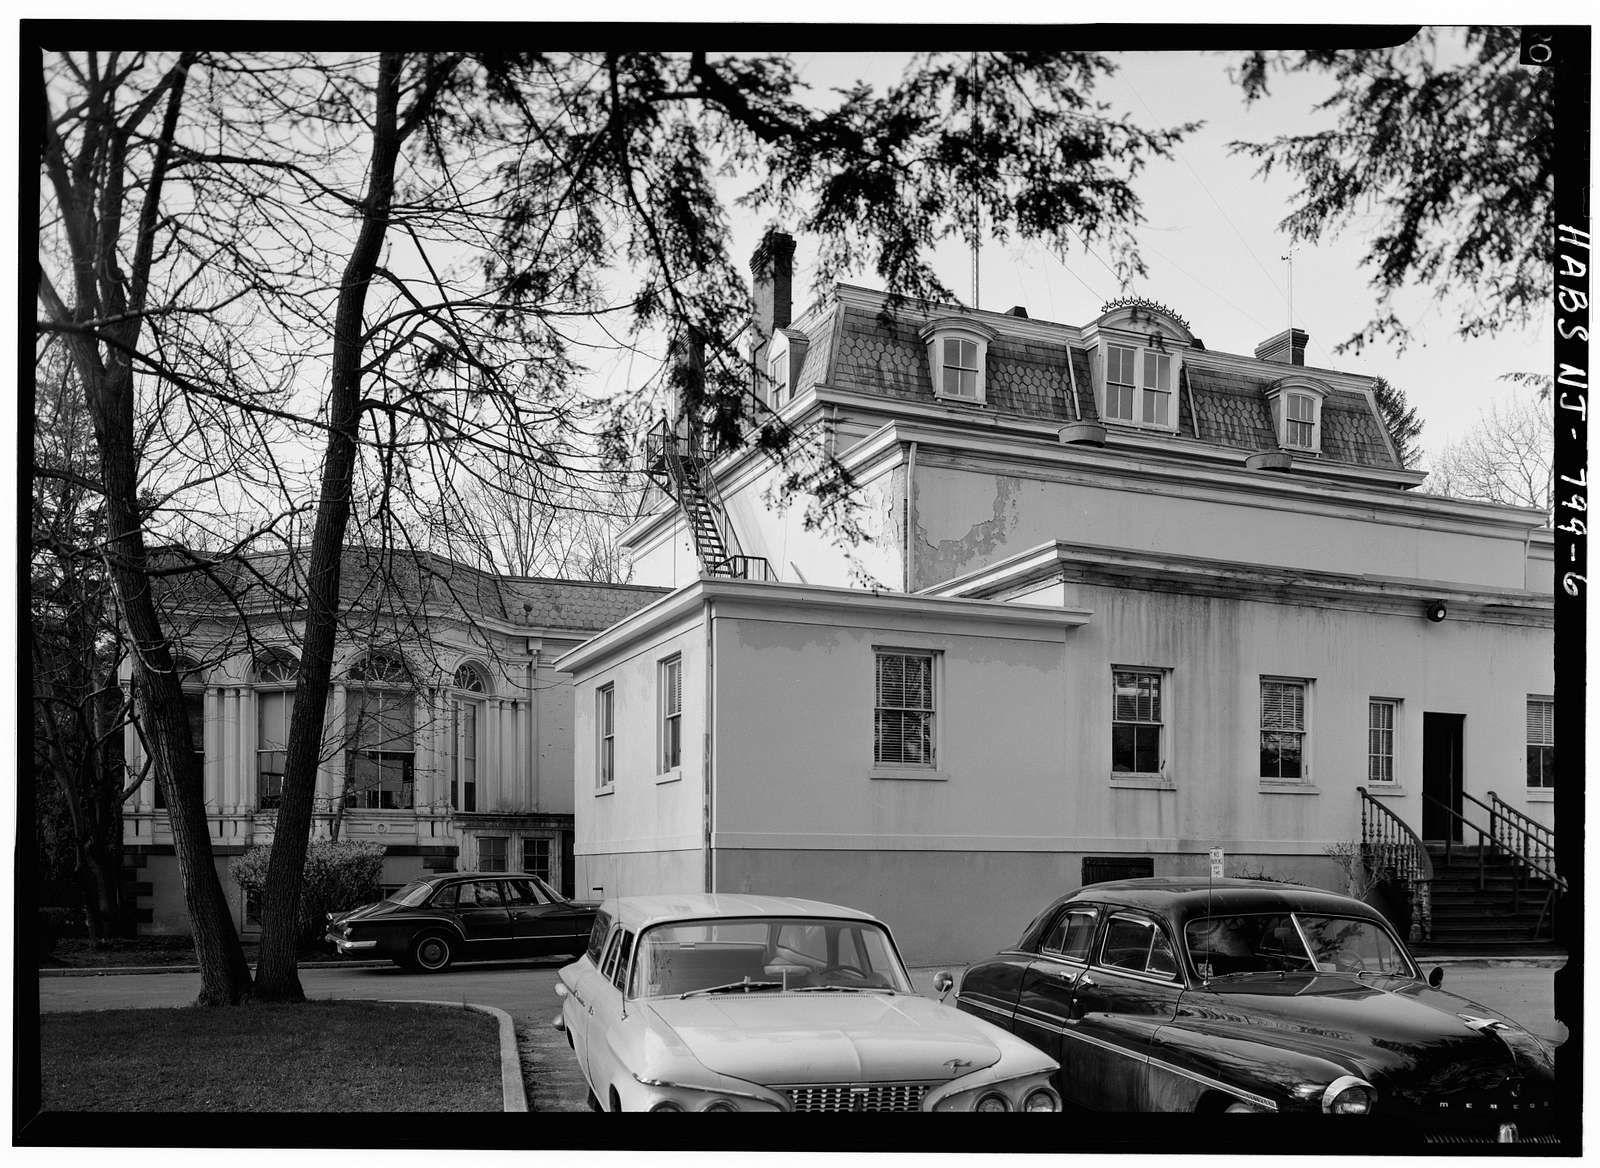 Princeton University, Borough Hall, 50 Stockton Street, Princeton, Mercer County, NJ